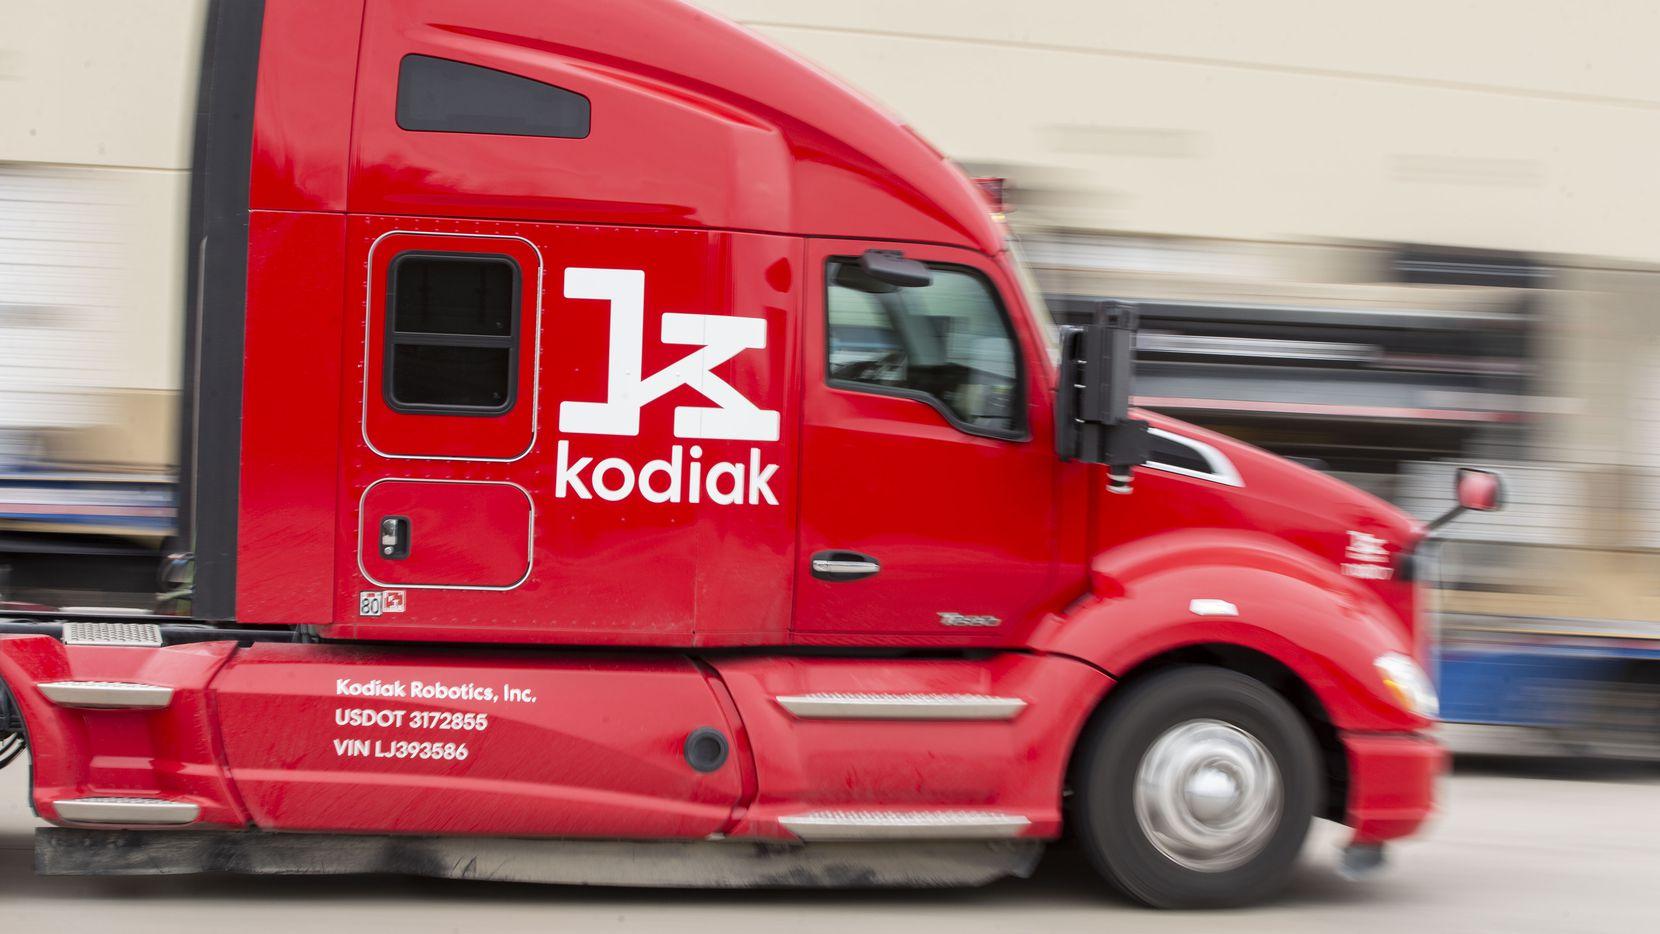 A Kodiak Robotics self-driving semi-truck completes a demonstration at the company's development warehouse in Lancaster.